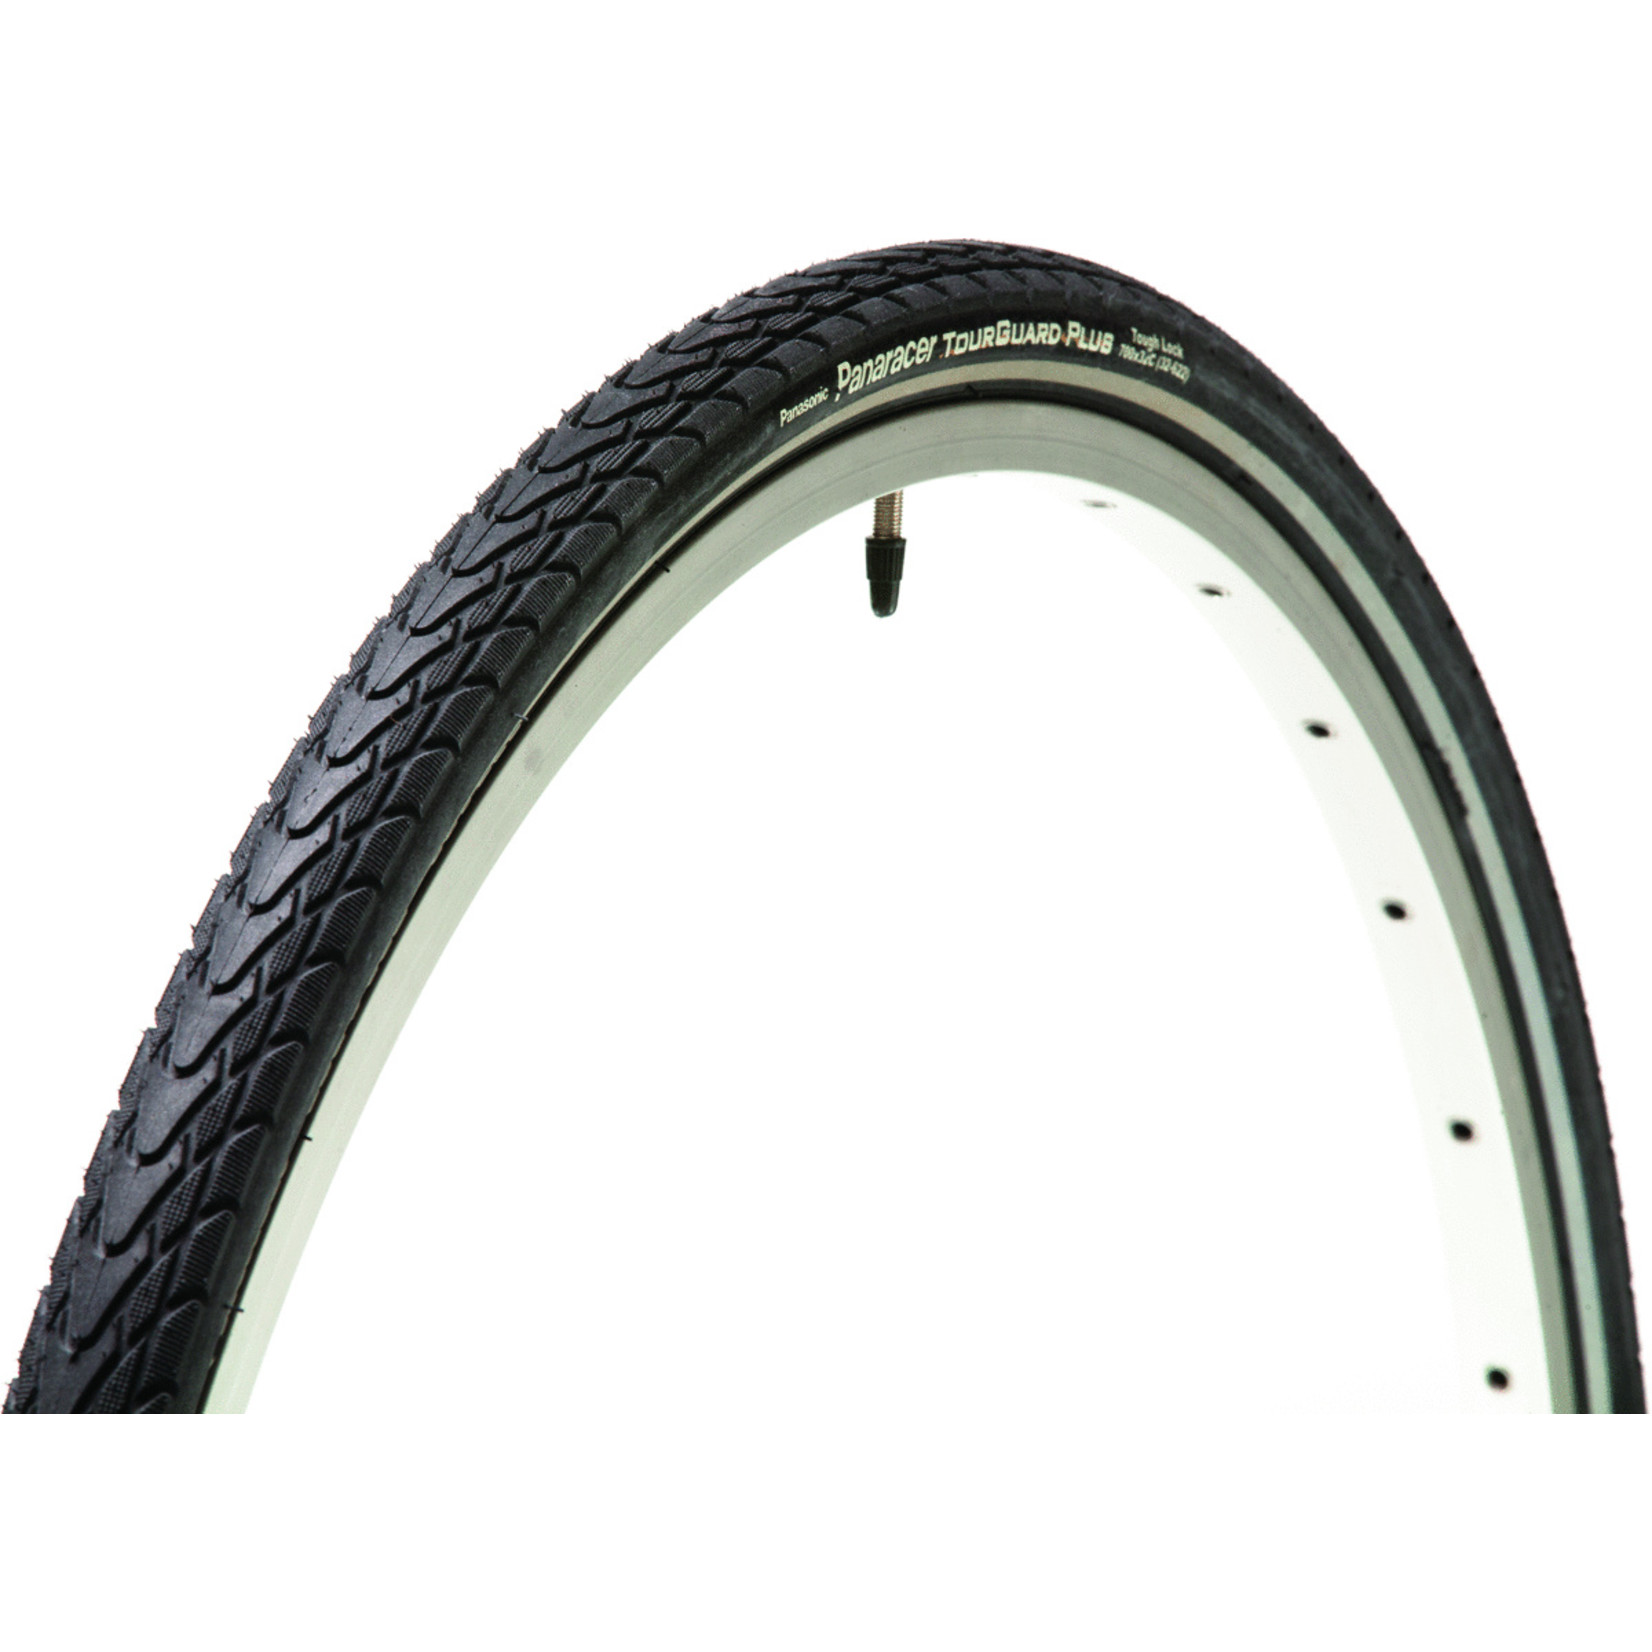 Panaracer Panaracer Tourguard Plus Tire